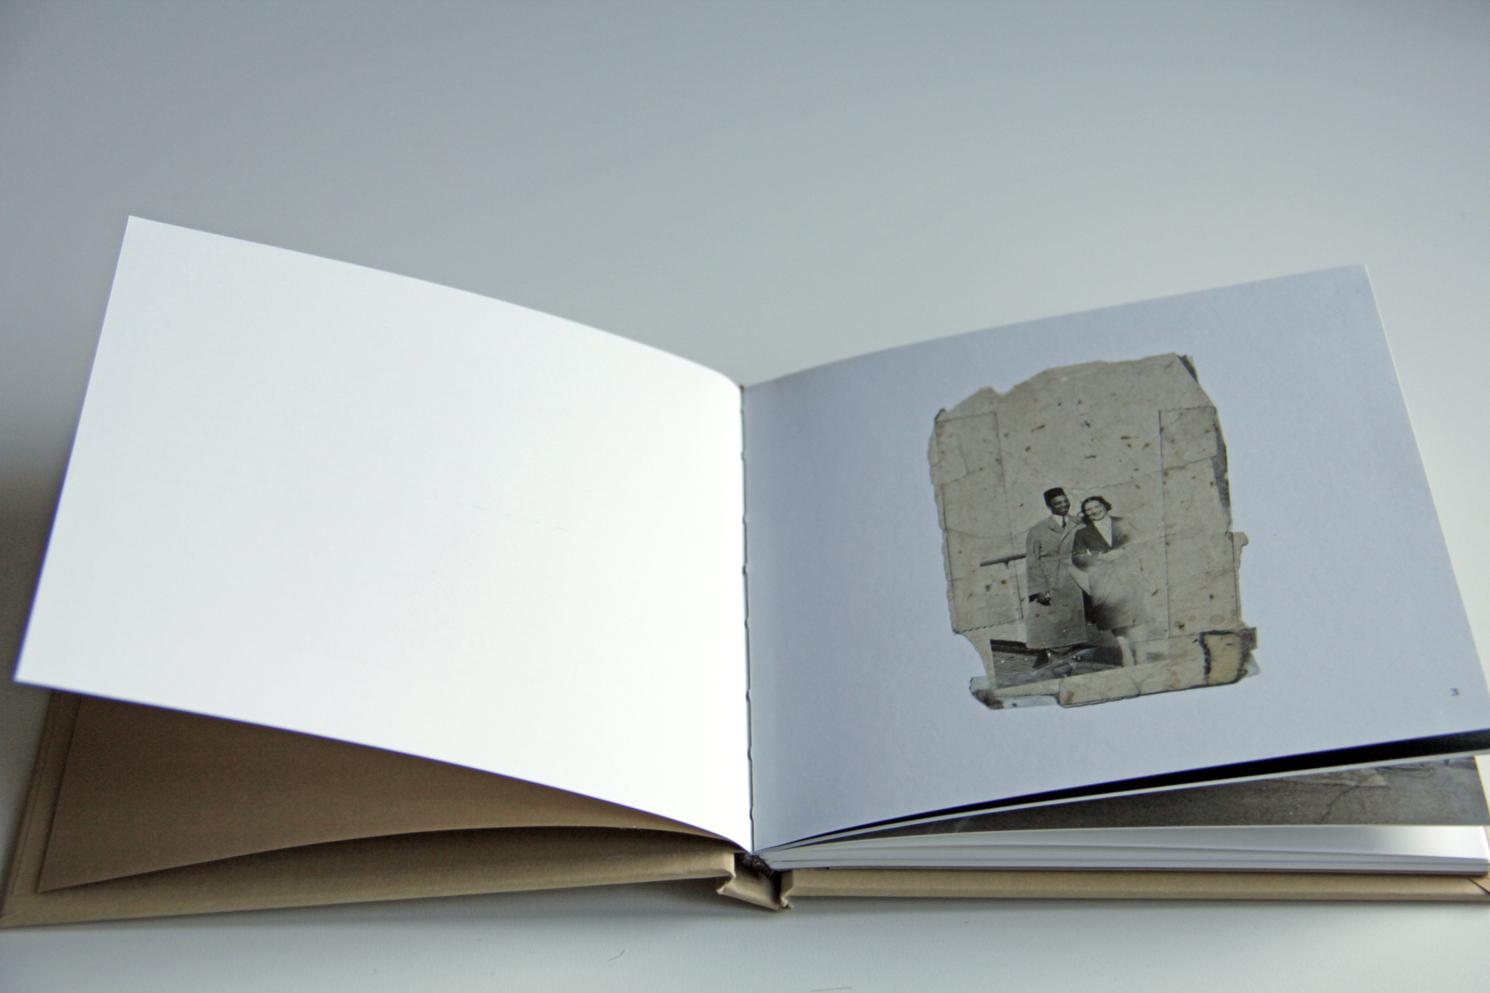 08 normalia book_MG_3748.jpg